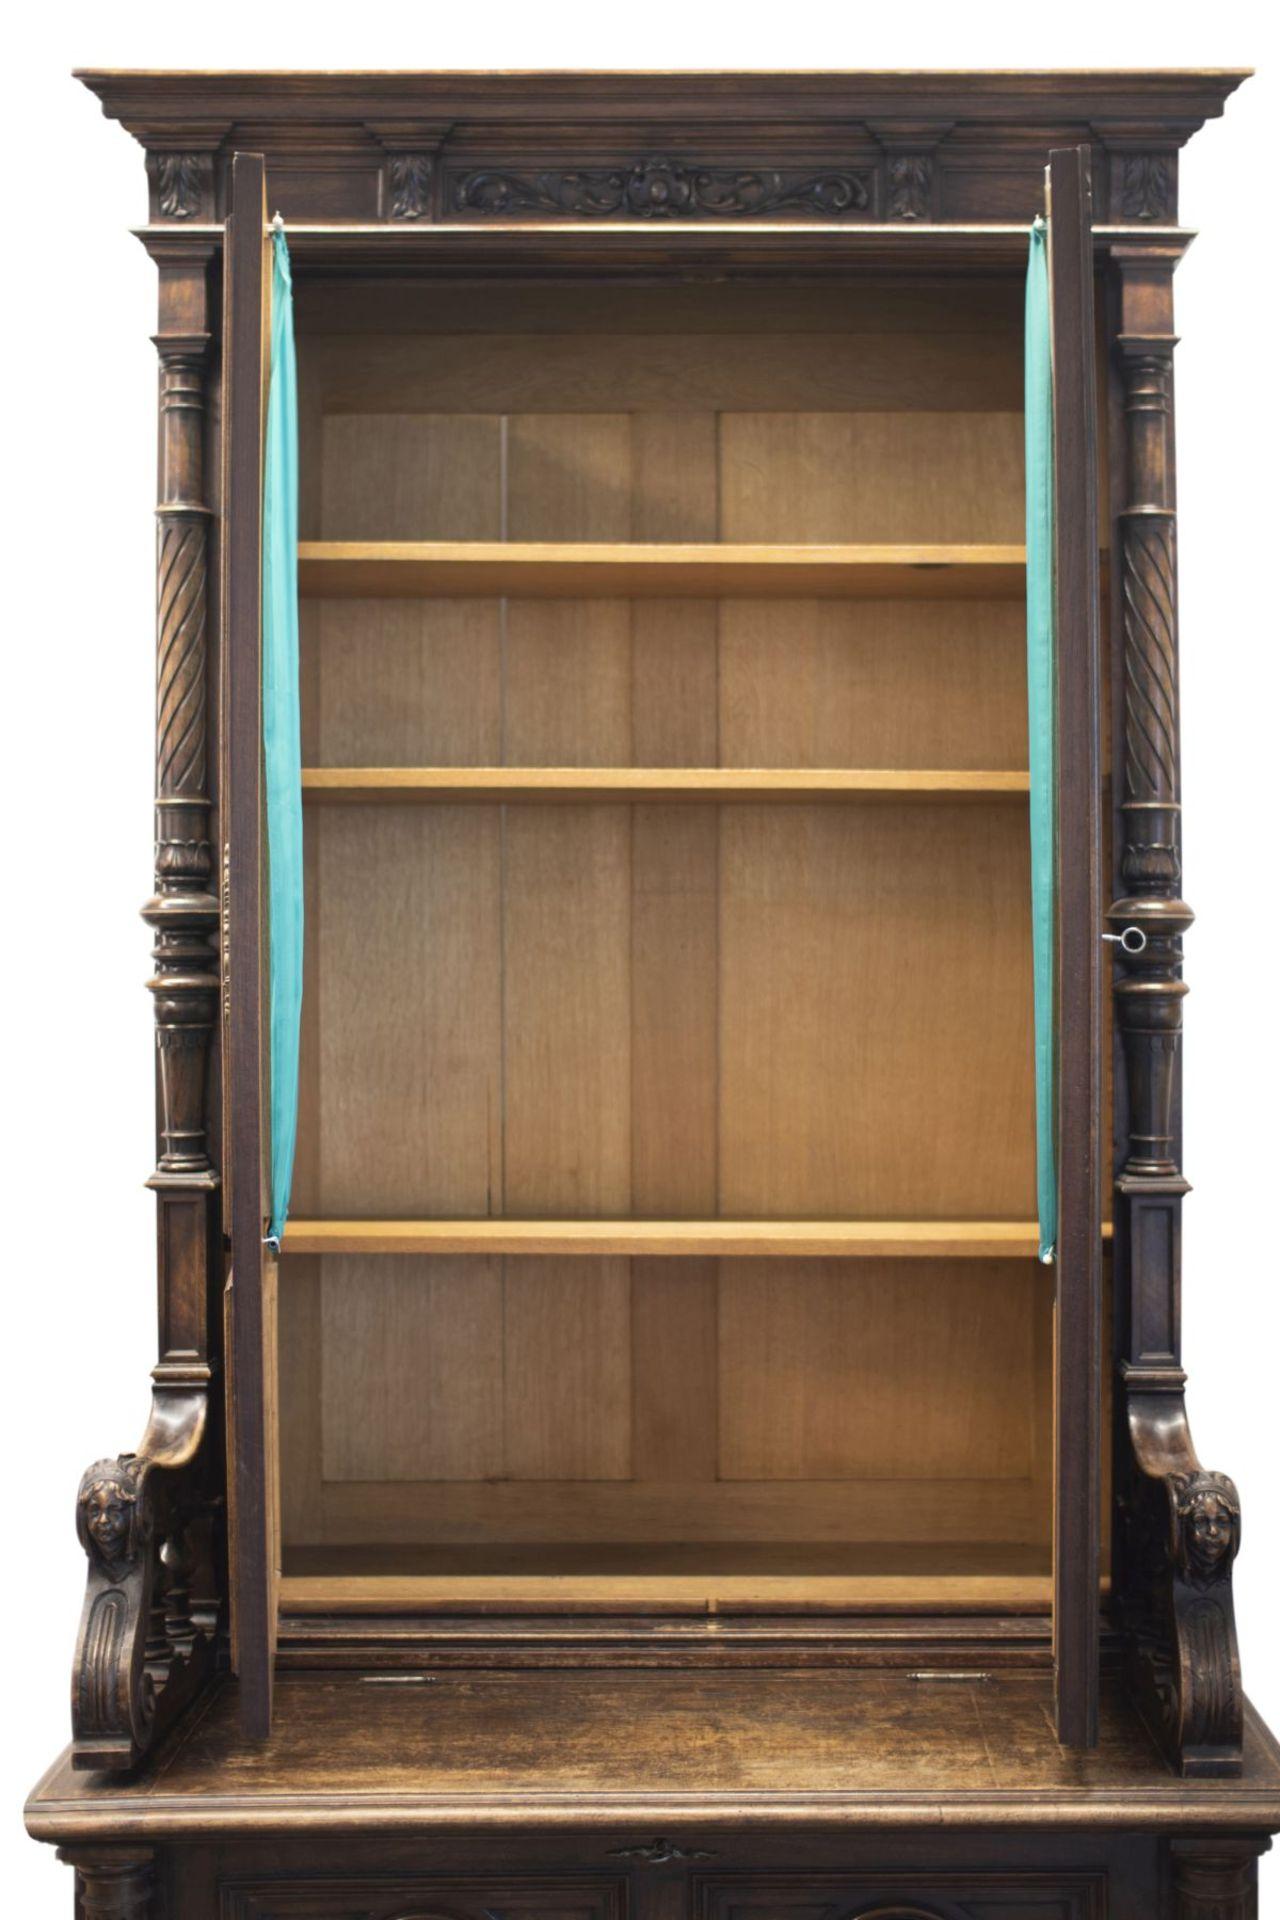 Bookshelf - Image 6 of 10